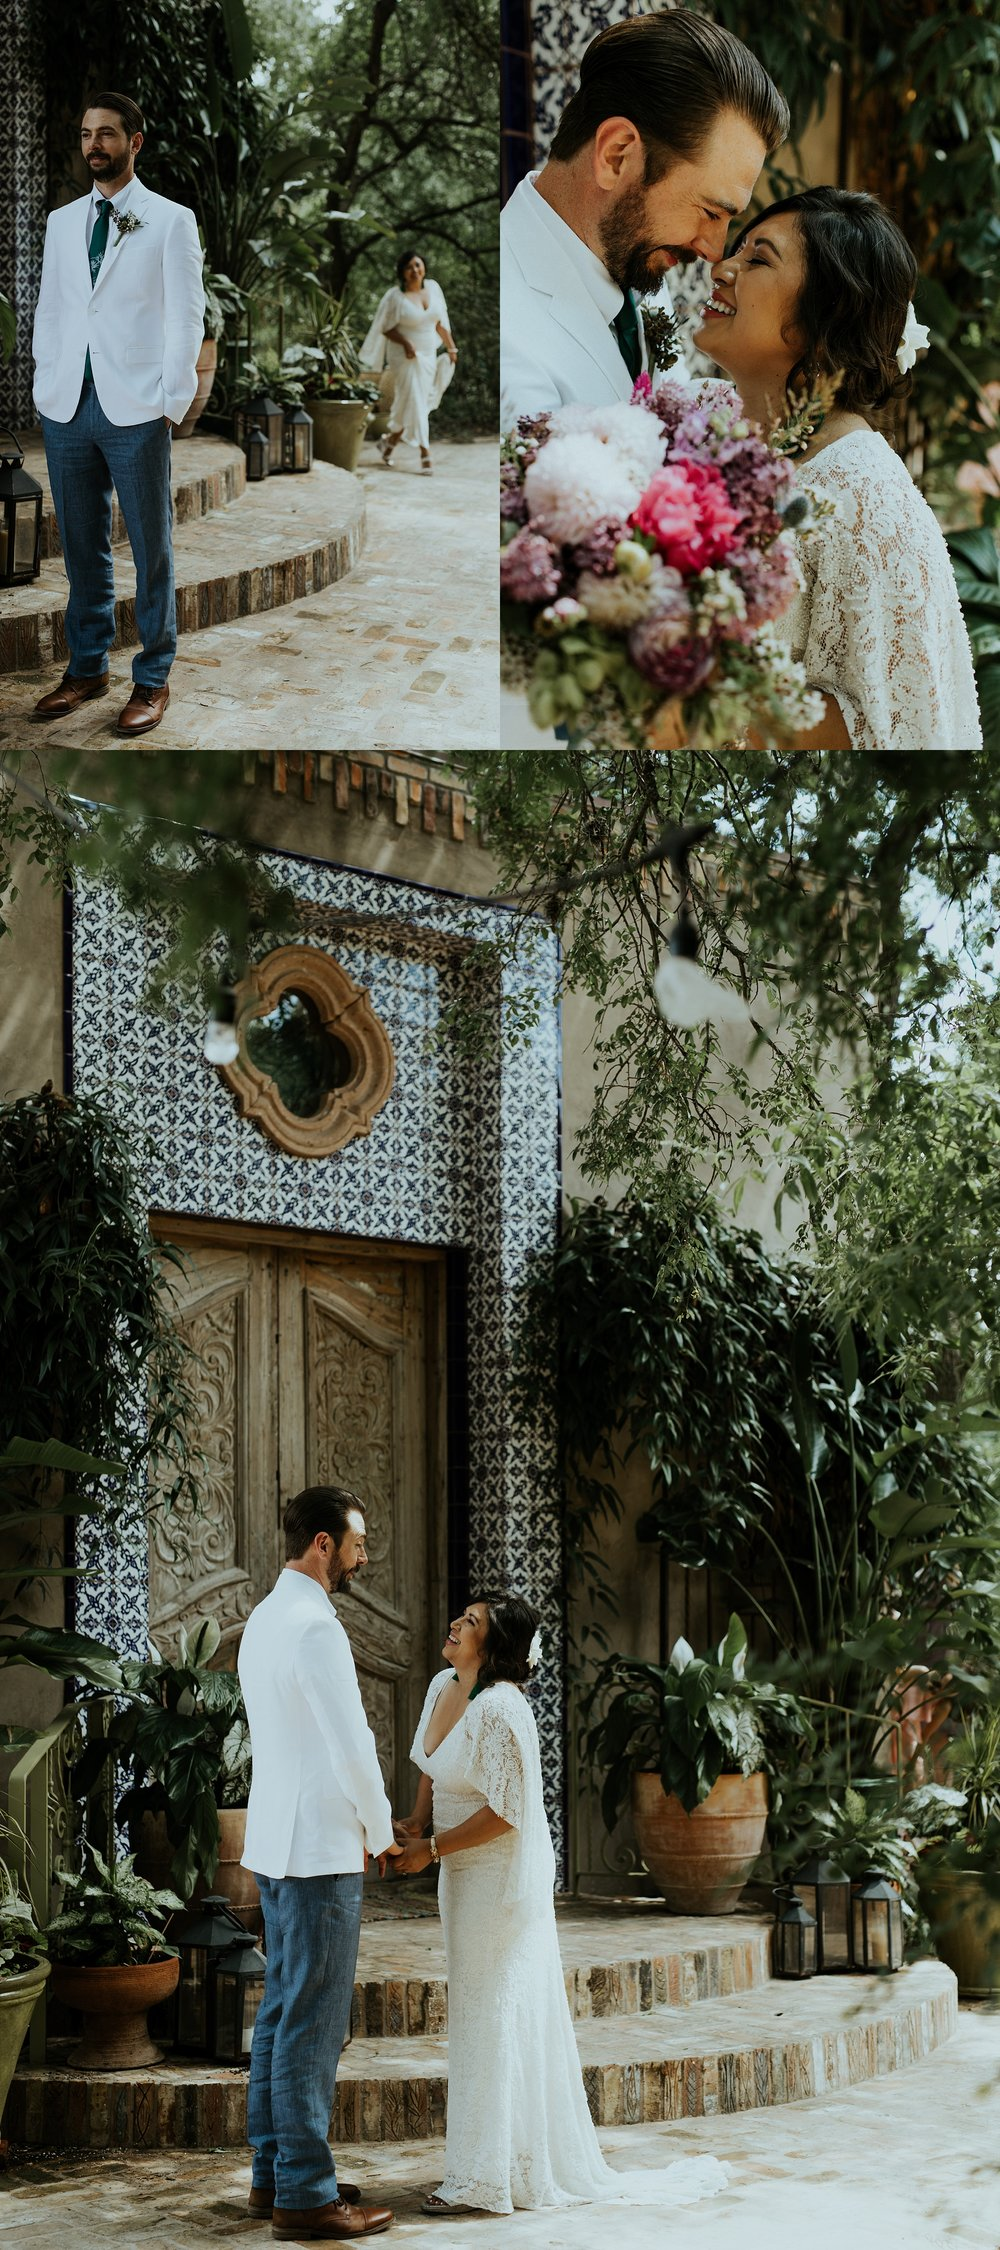 Vibrant Spring Wedding at the enchanting Jennifer's Gardens in Downtown Austin Texas_0016.jpg